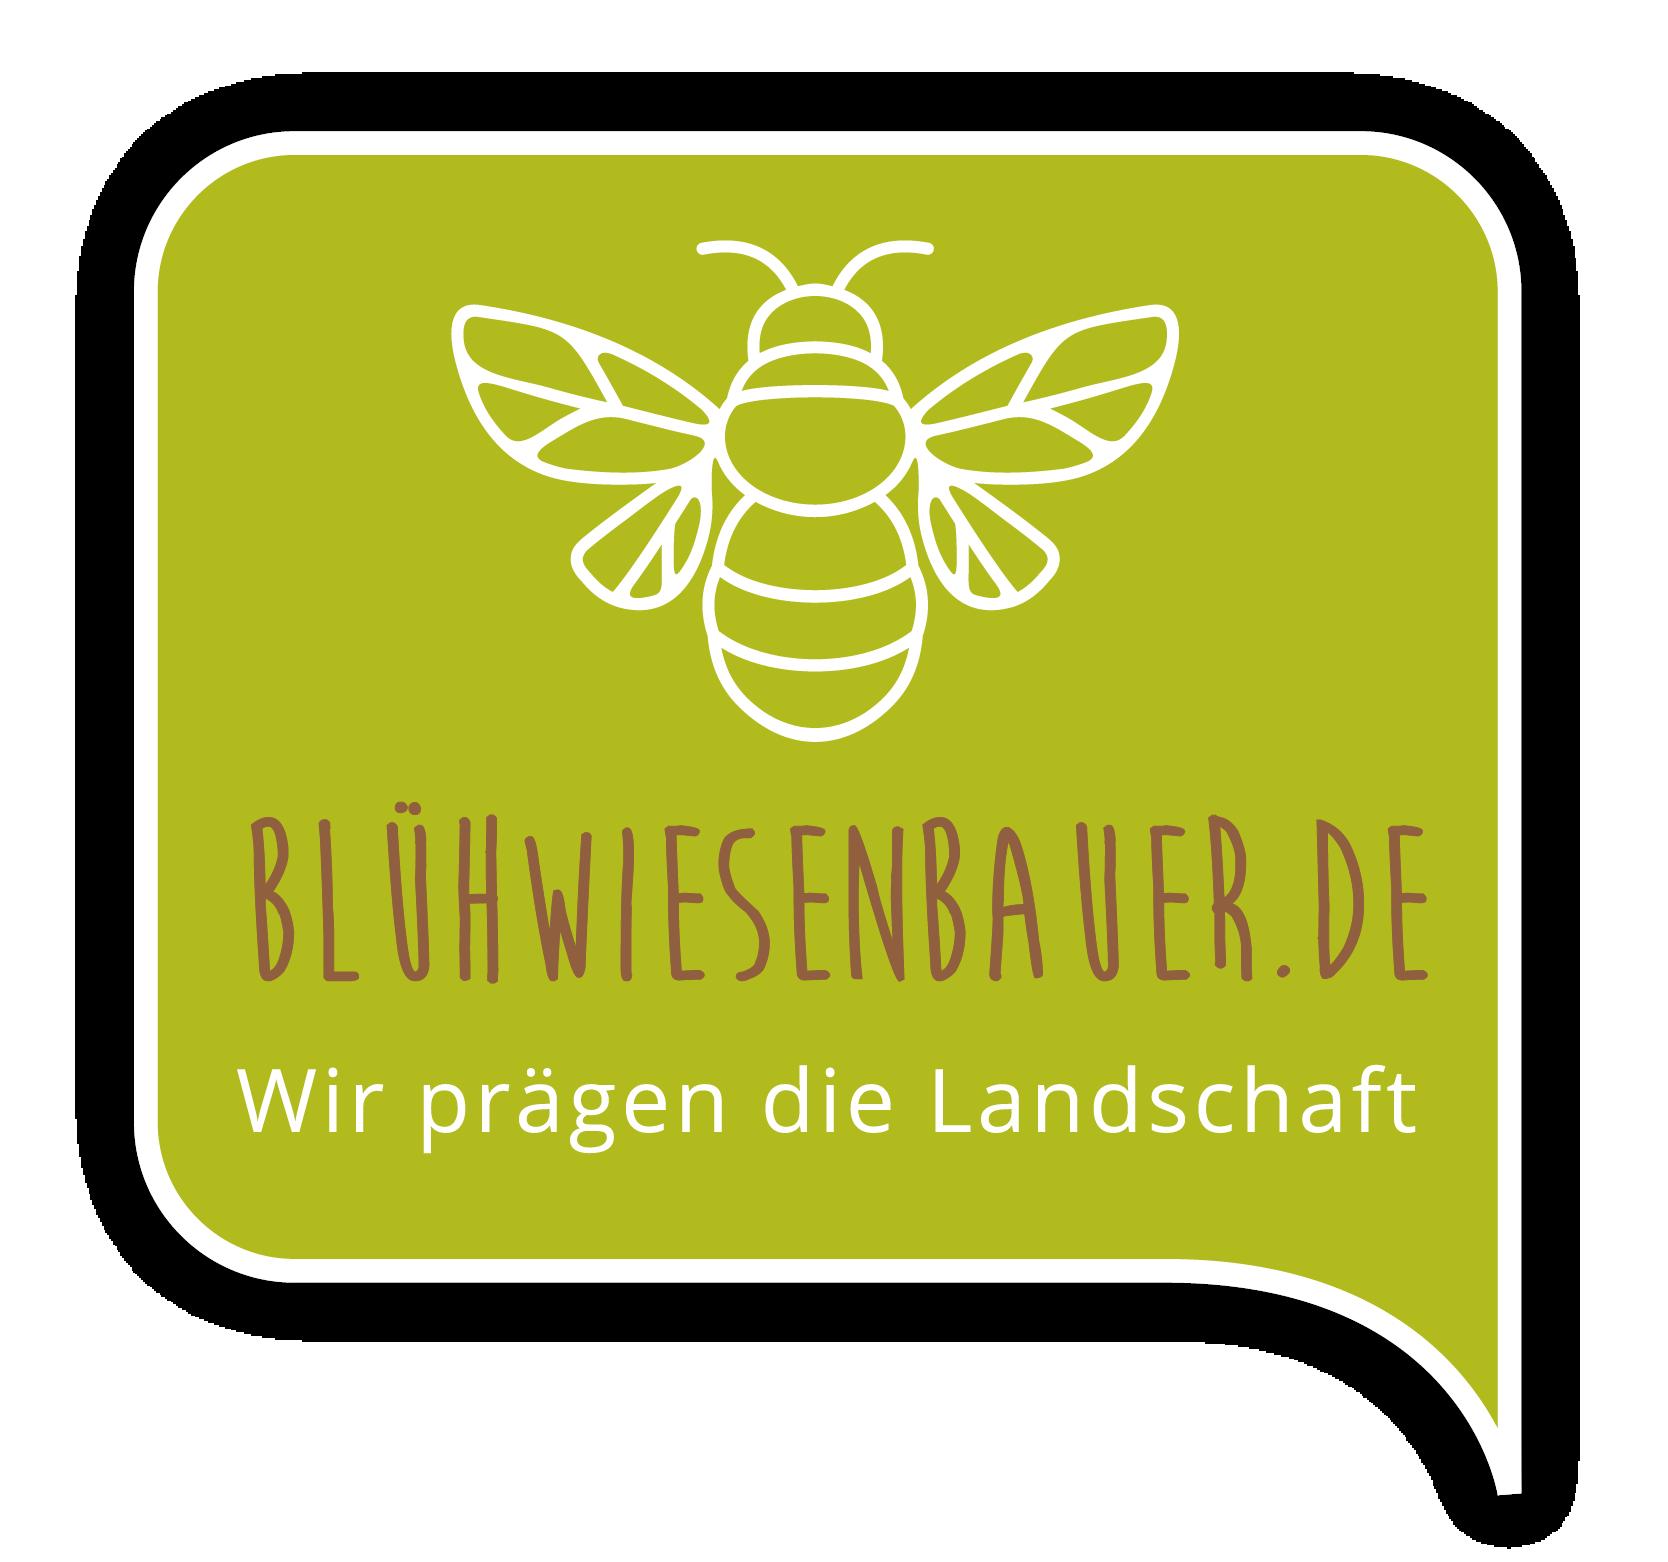 bluehwiesenbauer.de